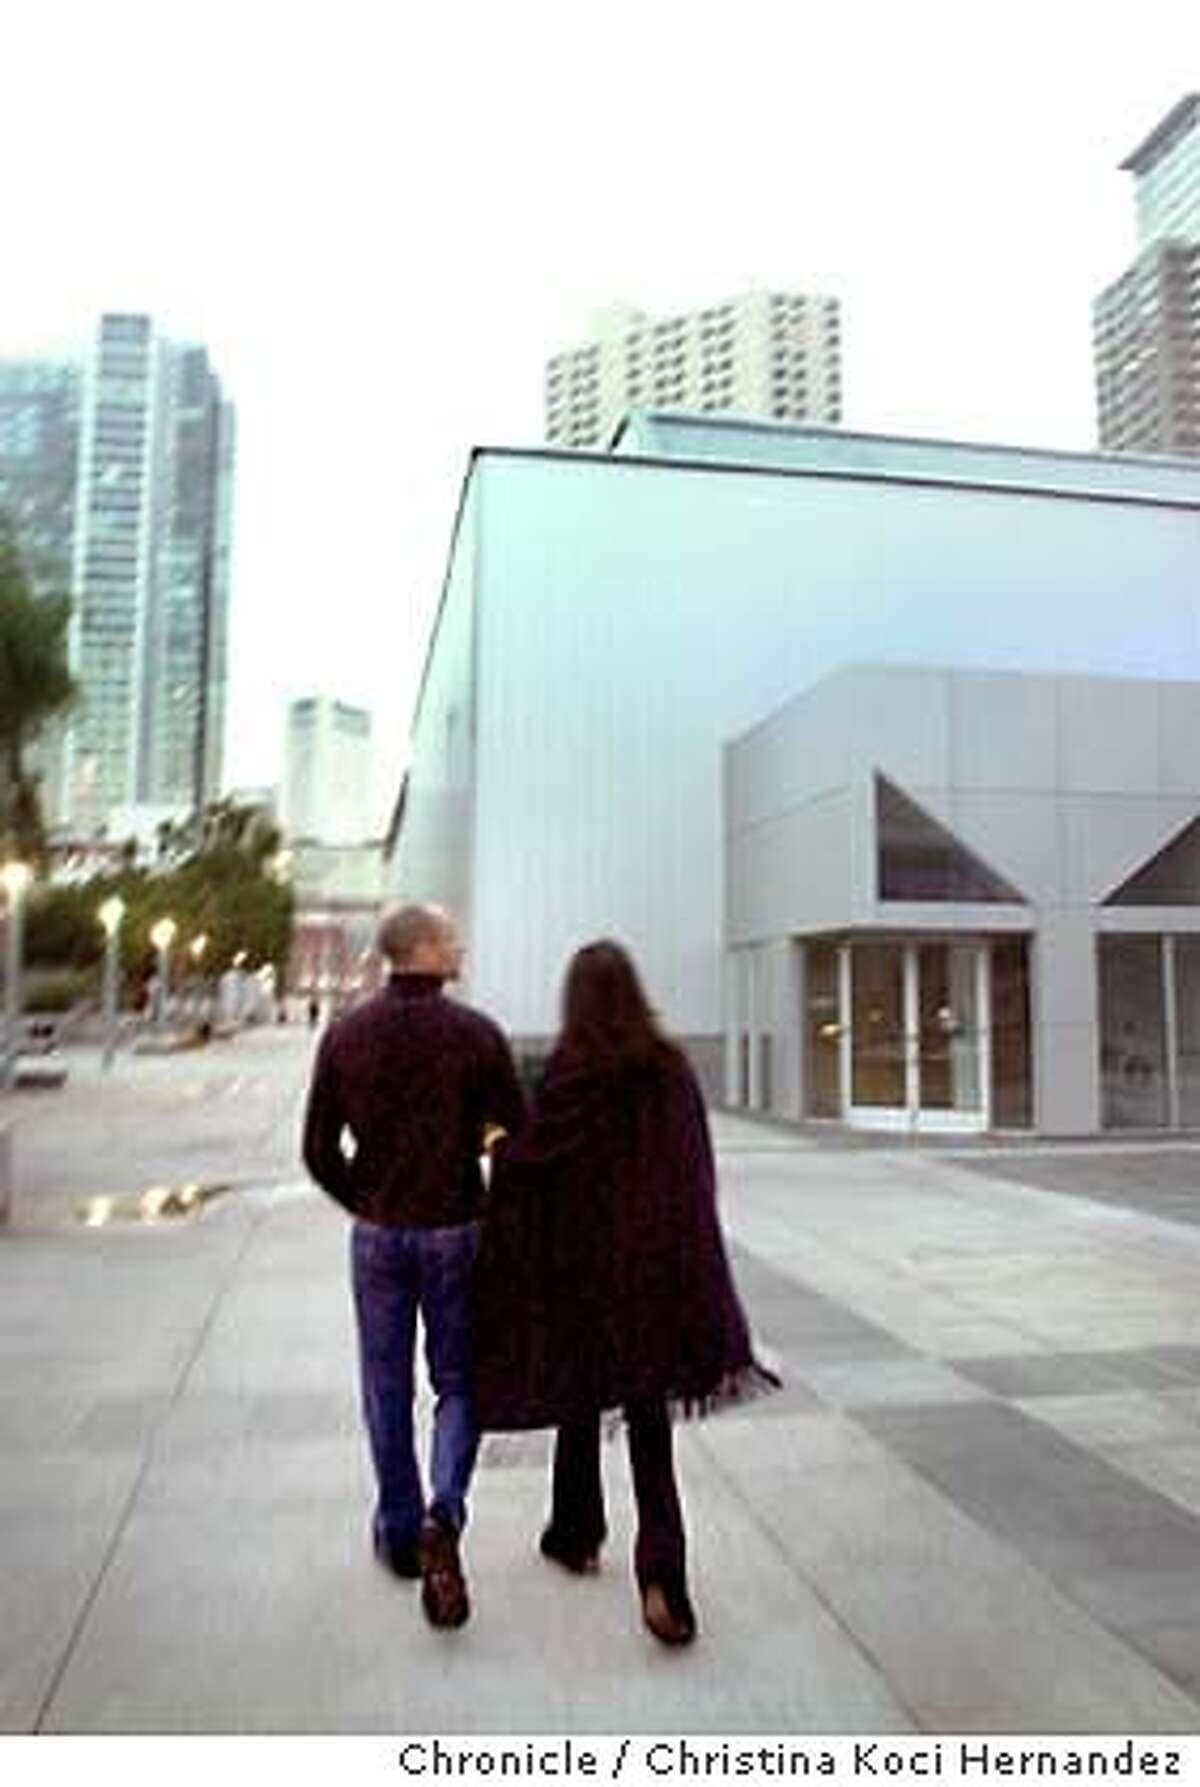 {100403_yerba_kocihernandez} A couple strolls toward the Forum at Buena Center for the Arts.For the 10th anniversary on Buena Center for the Arts, as well as the gardens. Shot on10/03/03 in San Francisco. CHRISTINA KOCI HERNANDEZ / The Chronicle